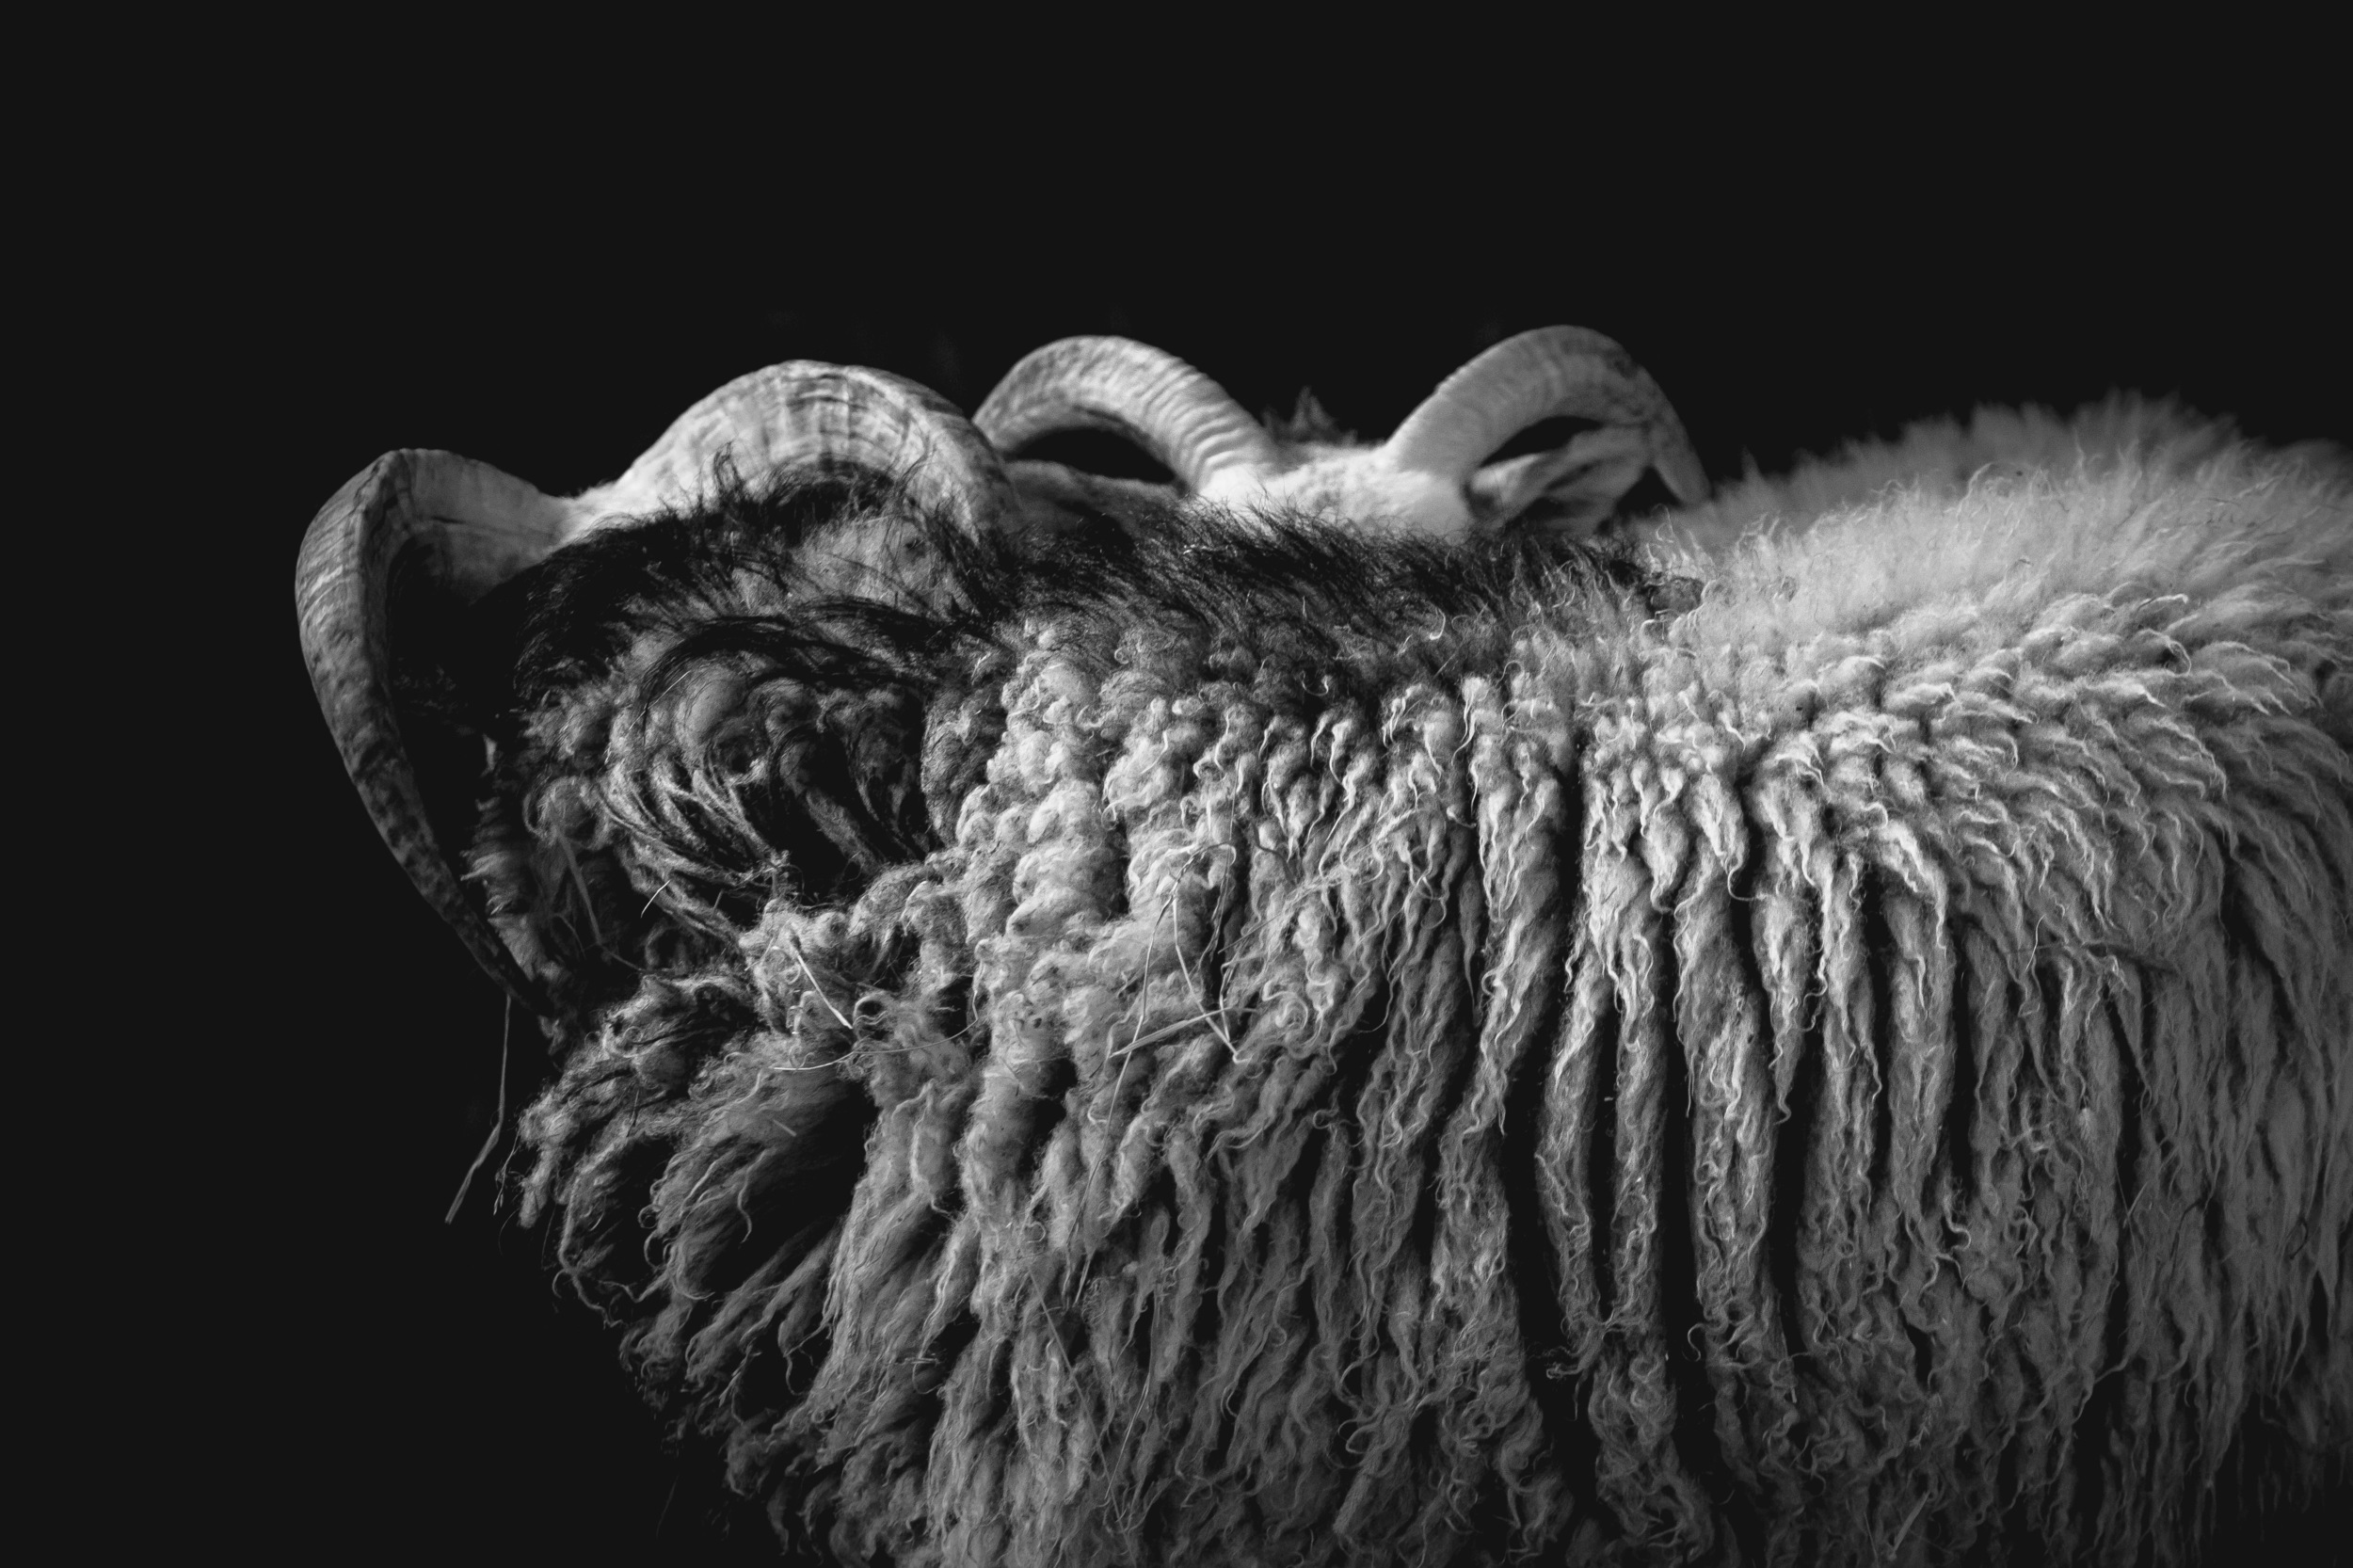 sweden-sheep-photography-myra-wippler.jpg